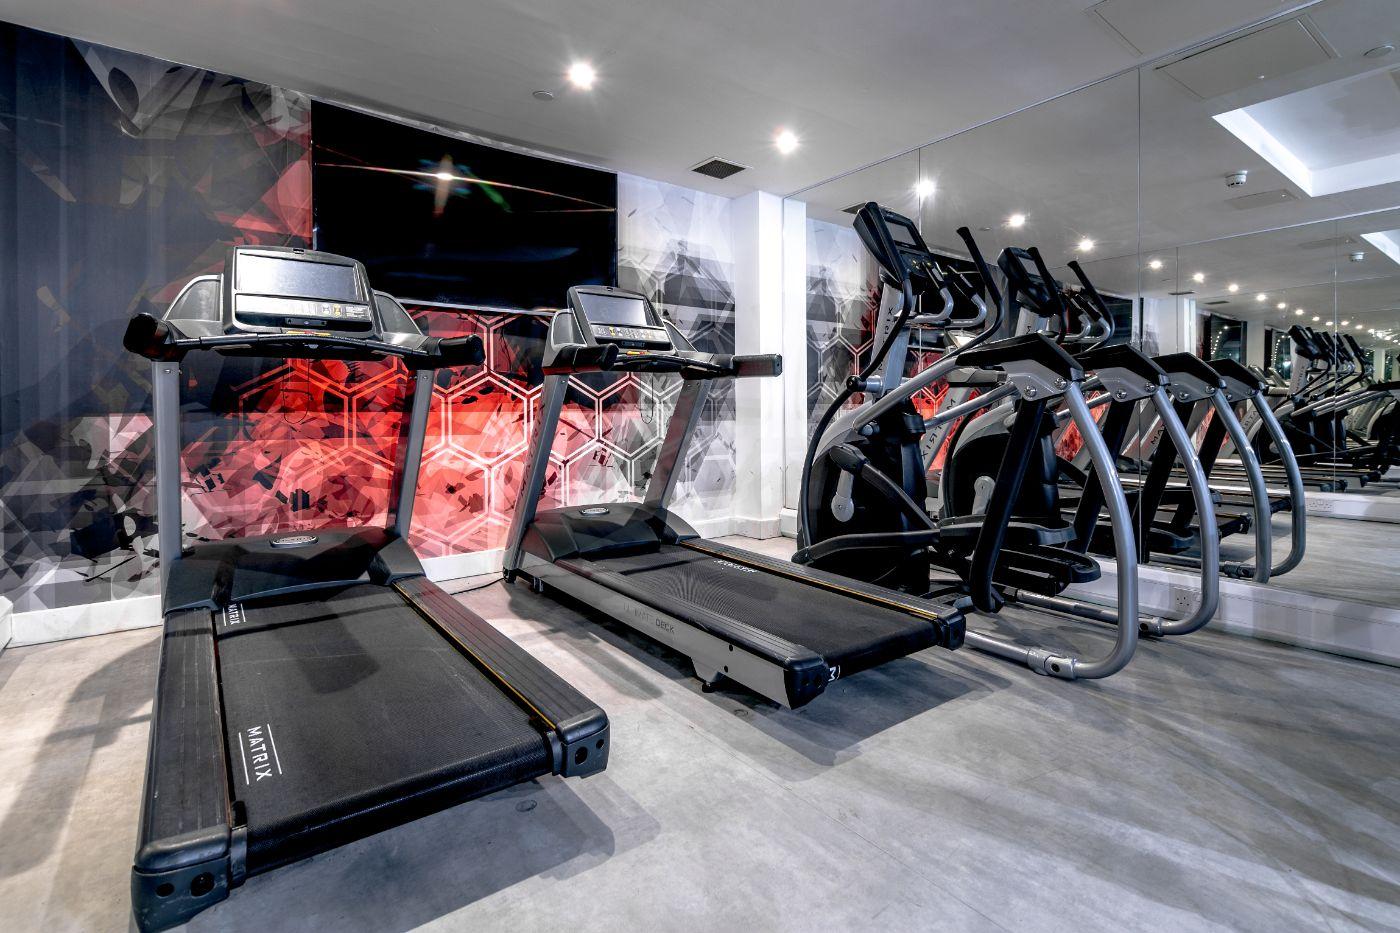 33 Parkside student accommodation gym